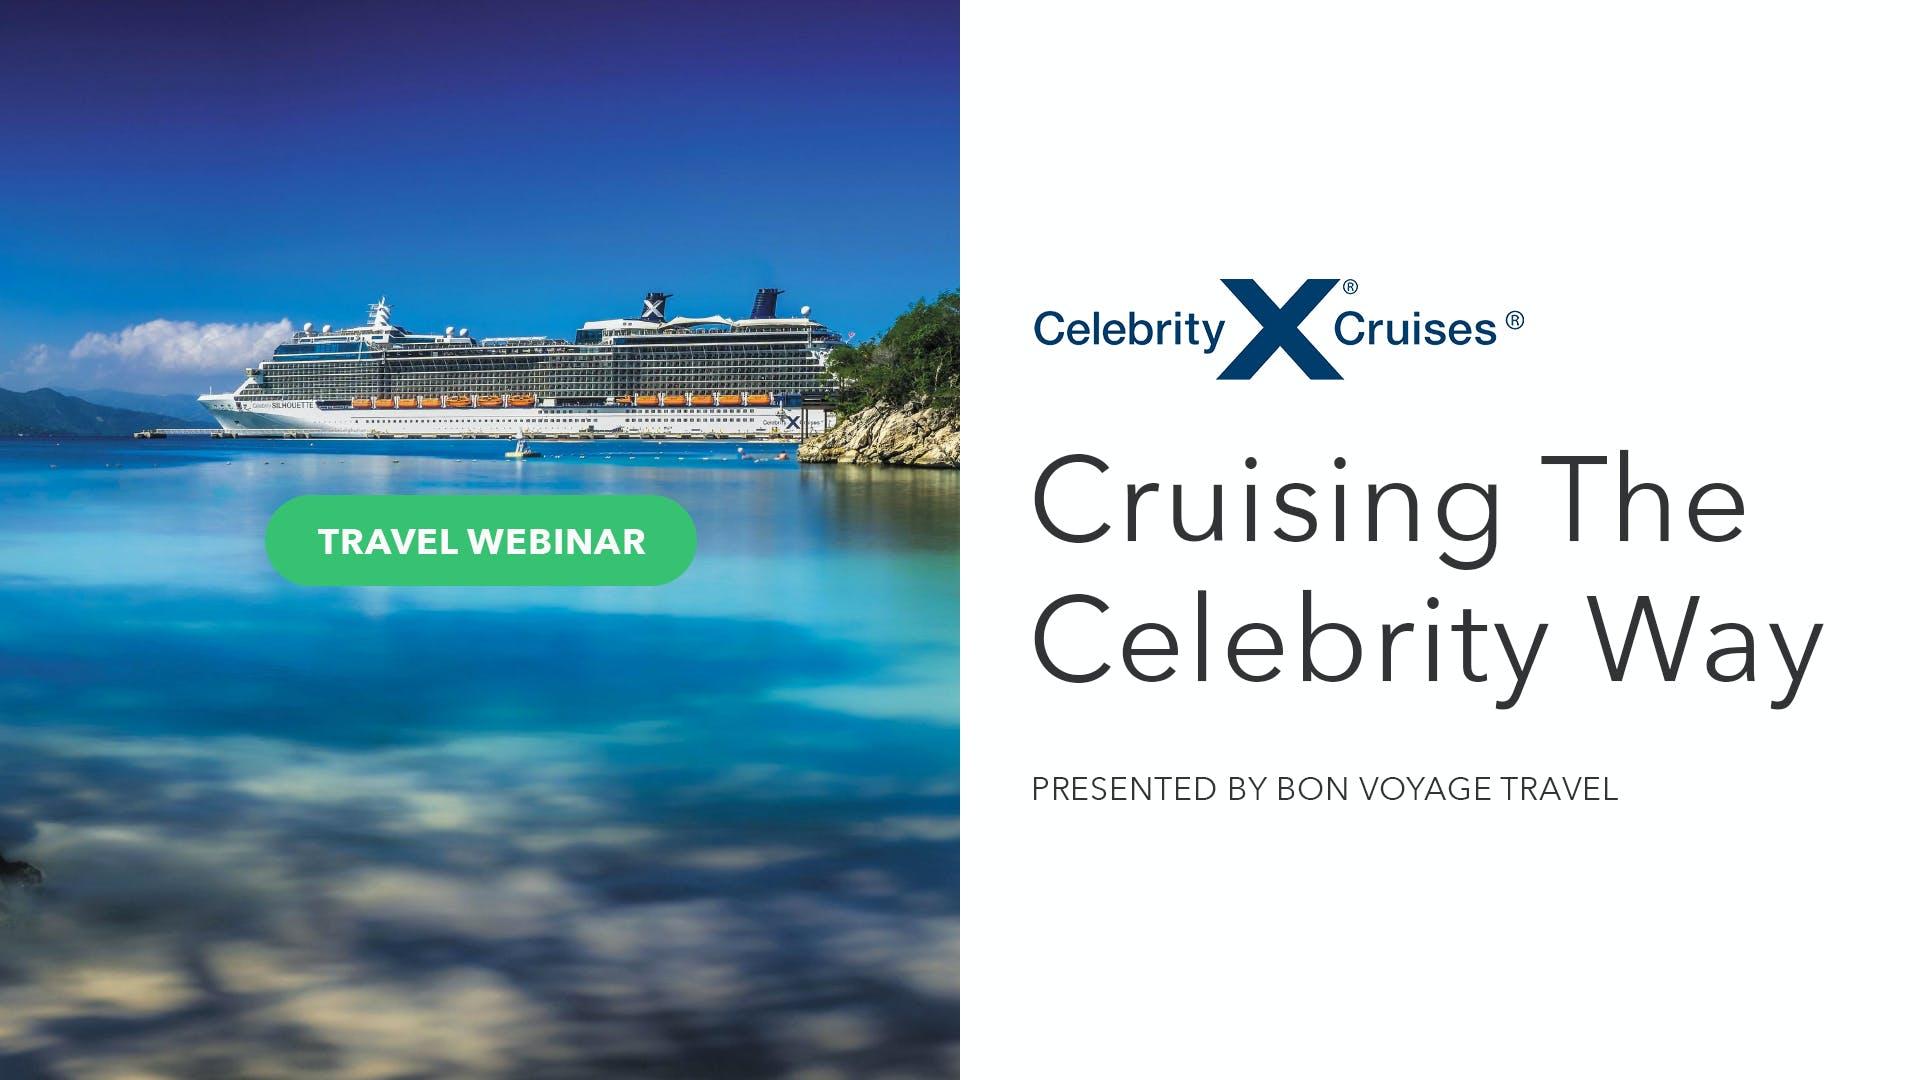 Cruising The Celebrity Way